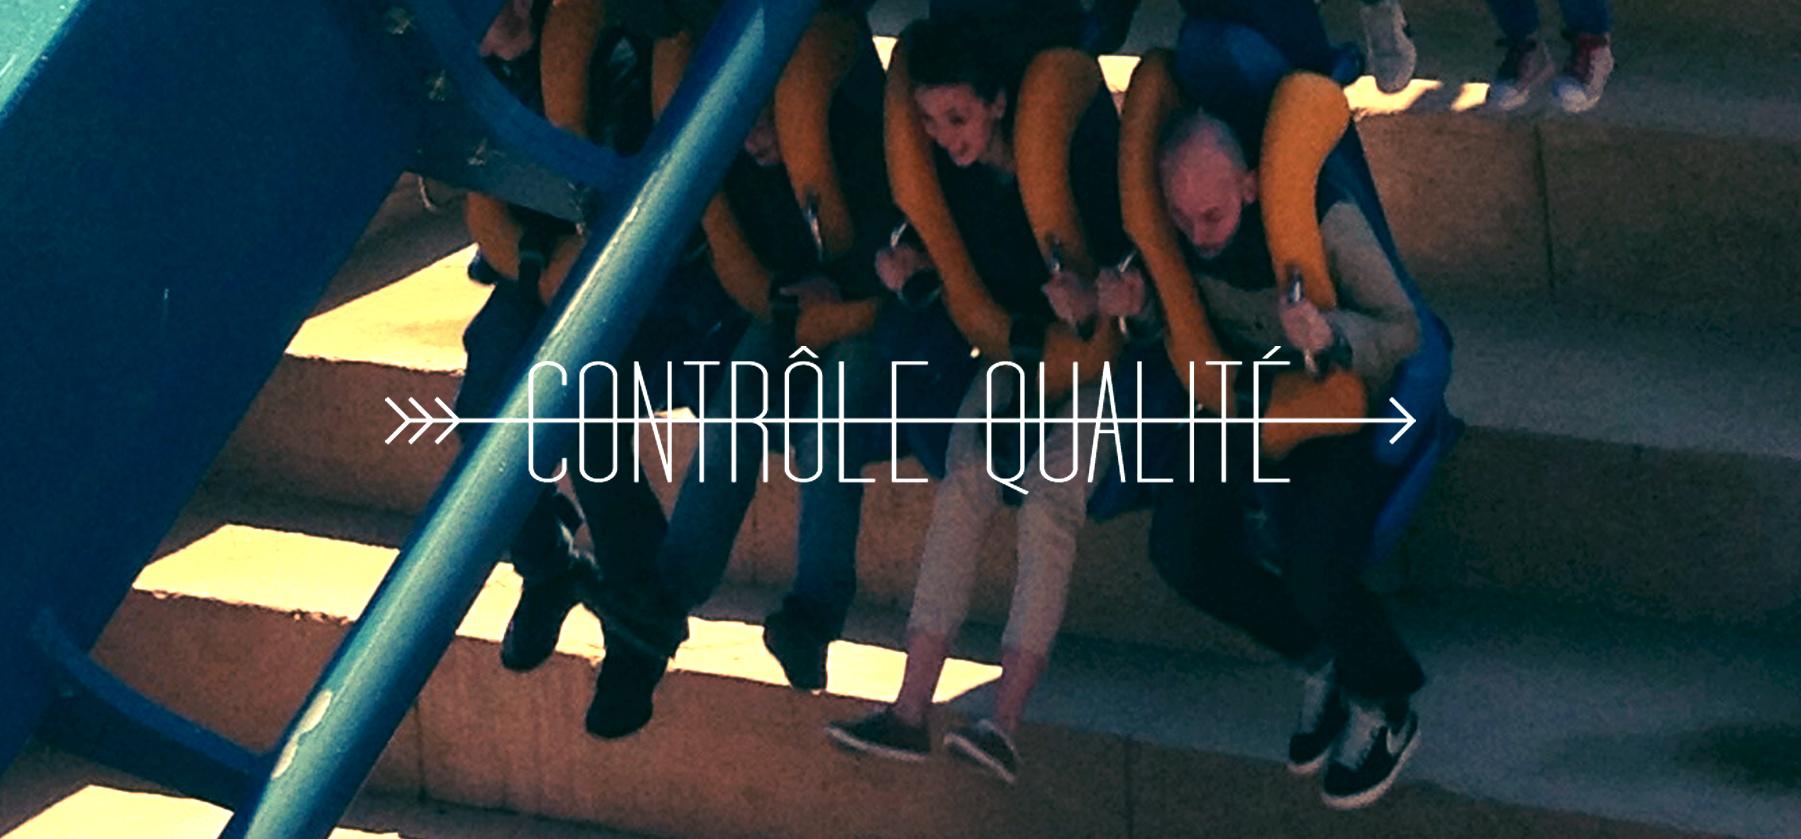 https://www.leparcorama.com/2012/05/27/controle-qualite-oziris/